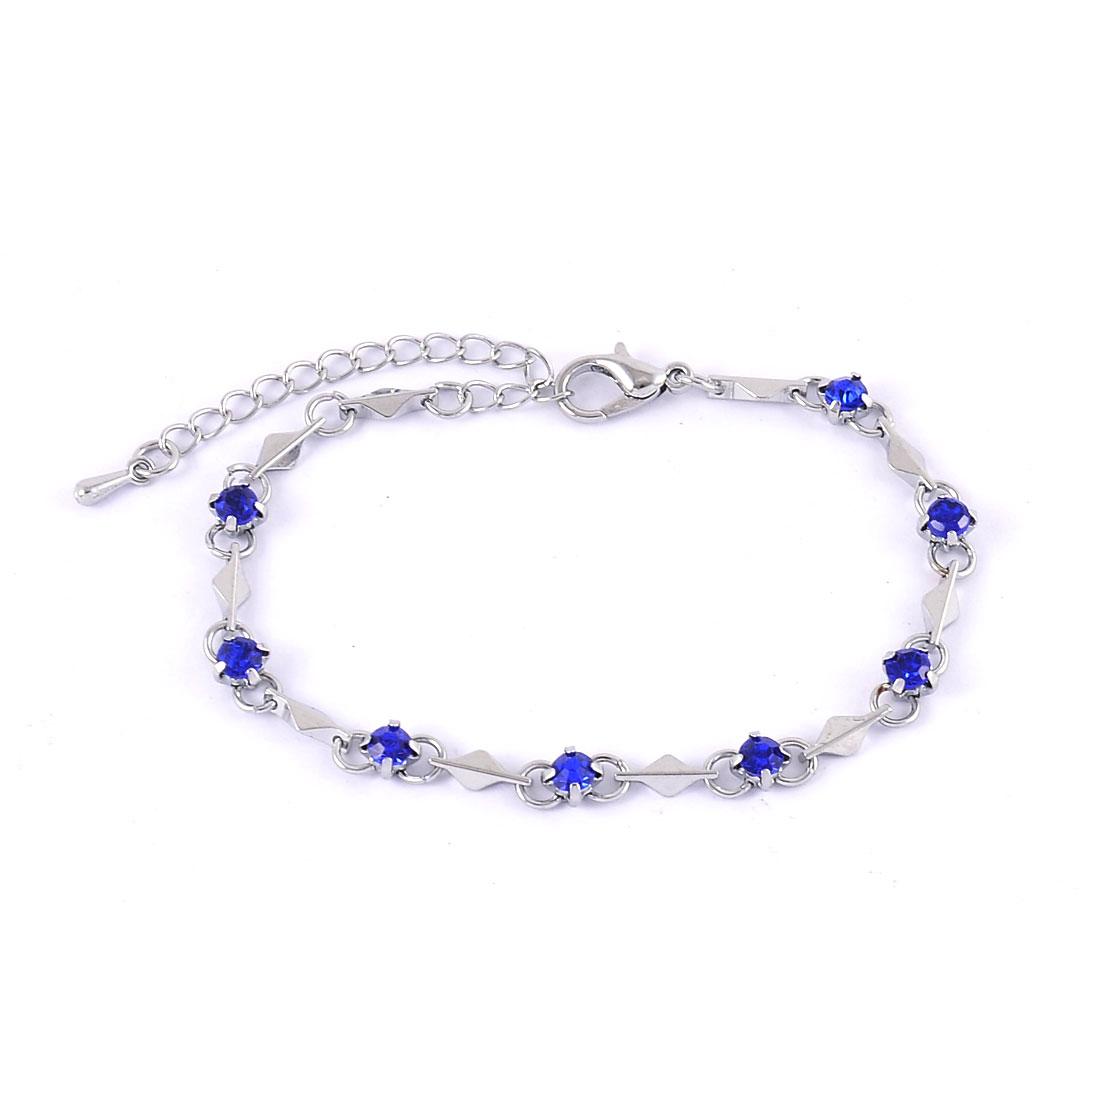 Ladies Round Artifical Ornament Beaded Bracelet Wrist Bangle Royal Blue